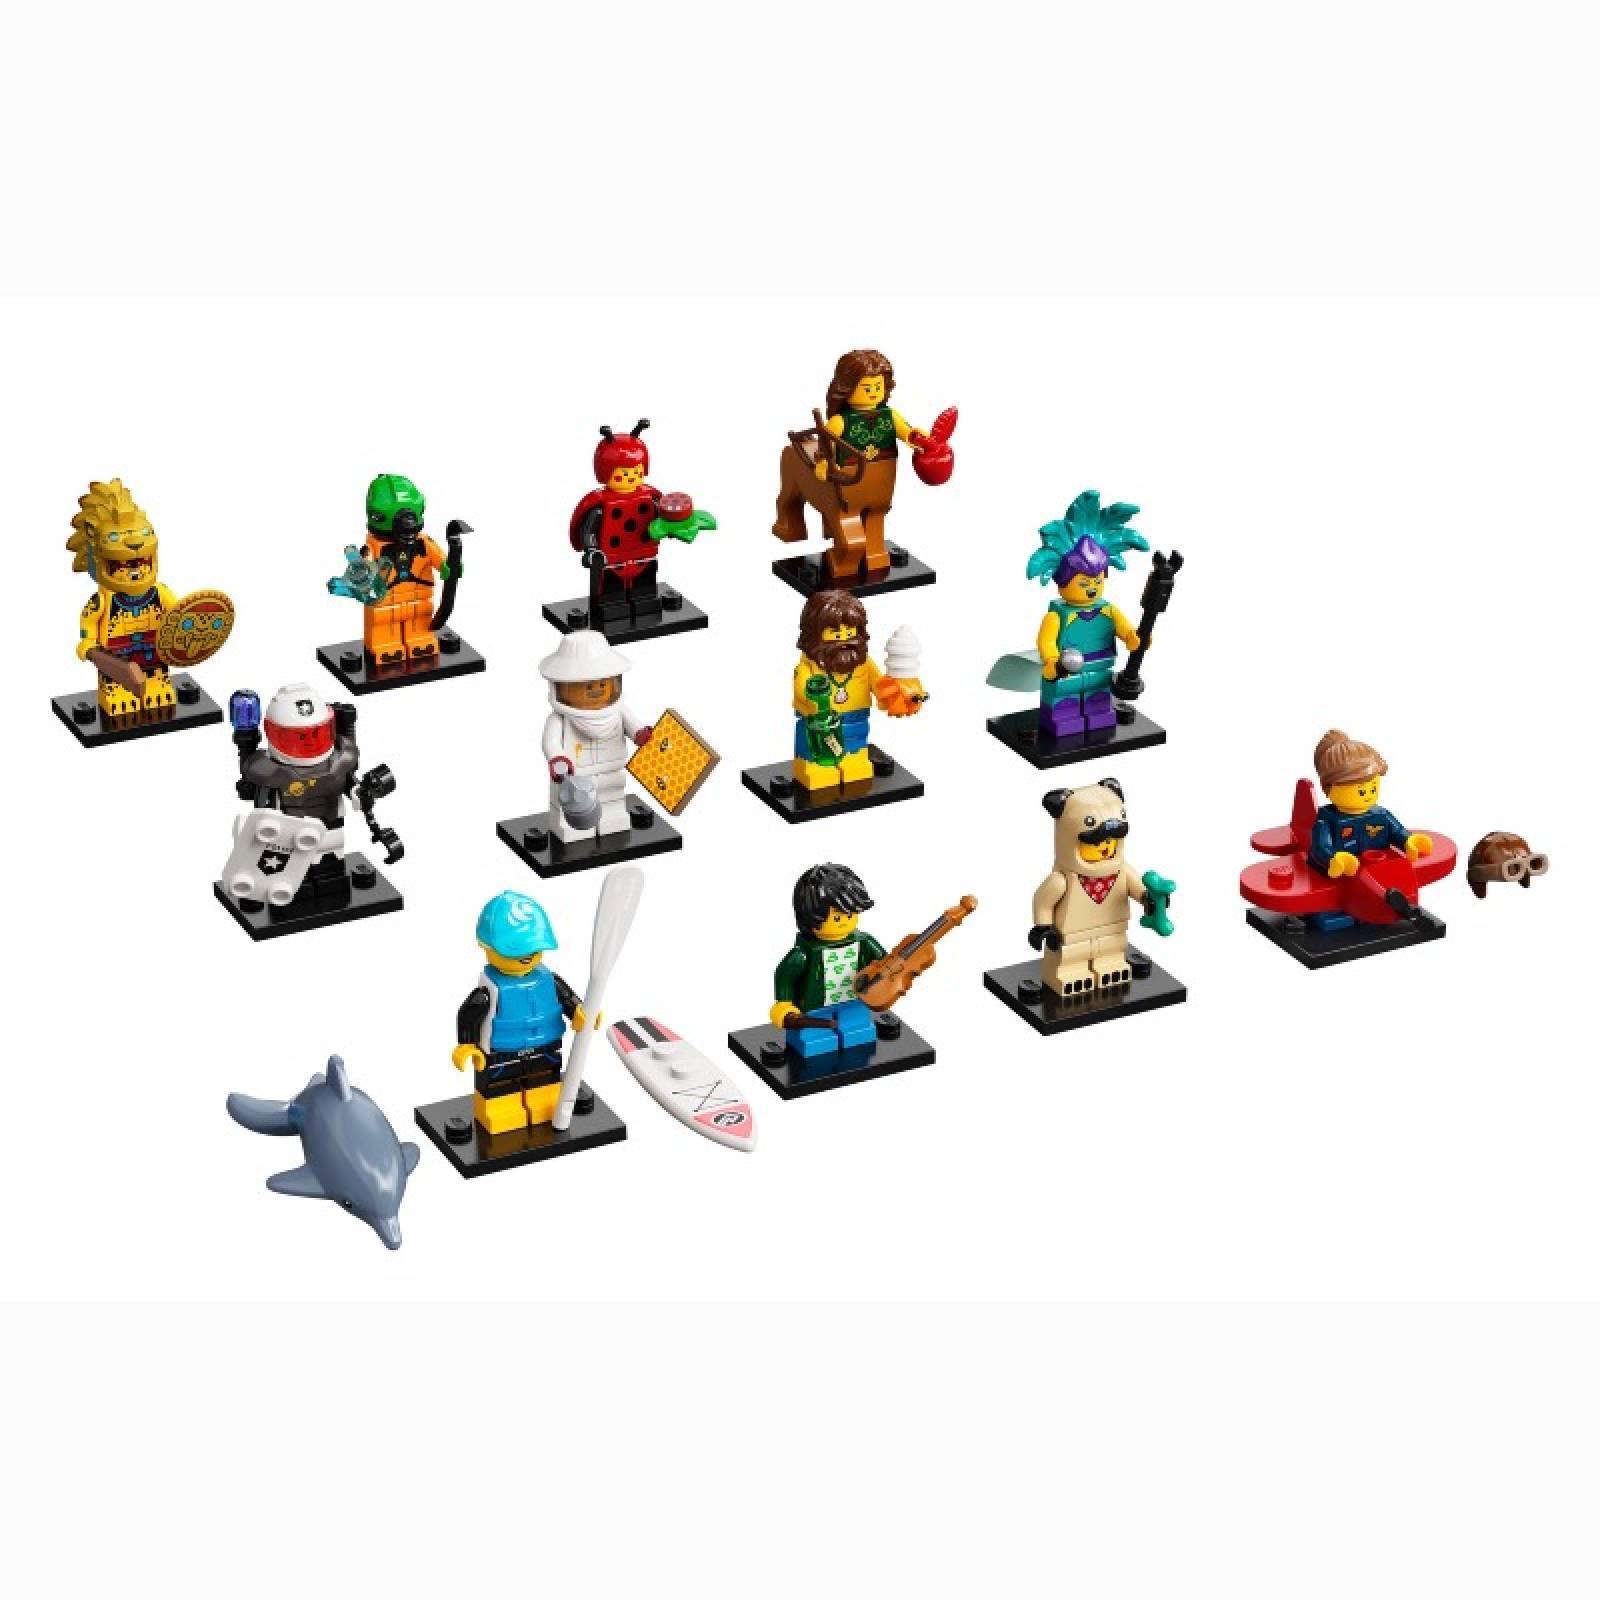 LEGO Minifigures Series 21 thumbnails